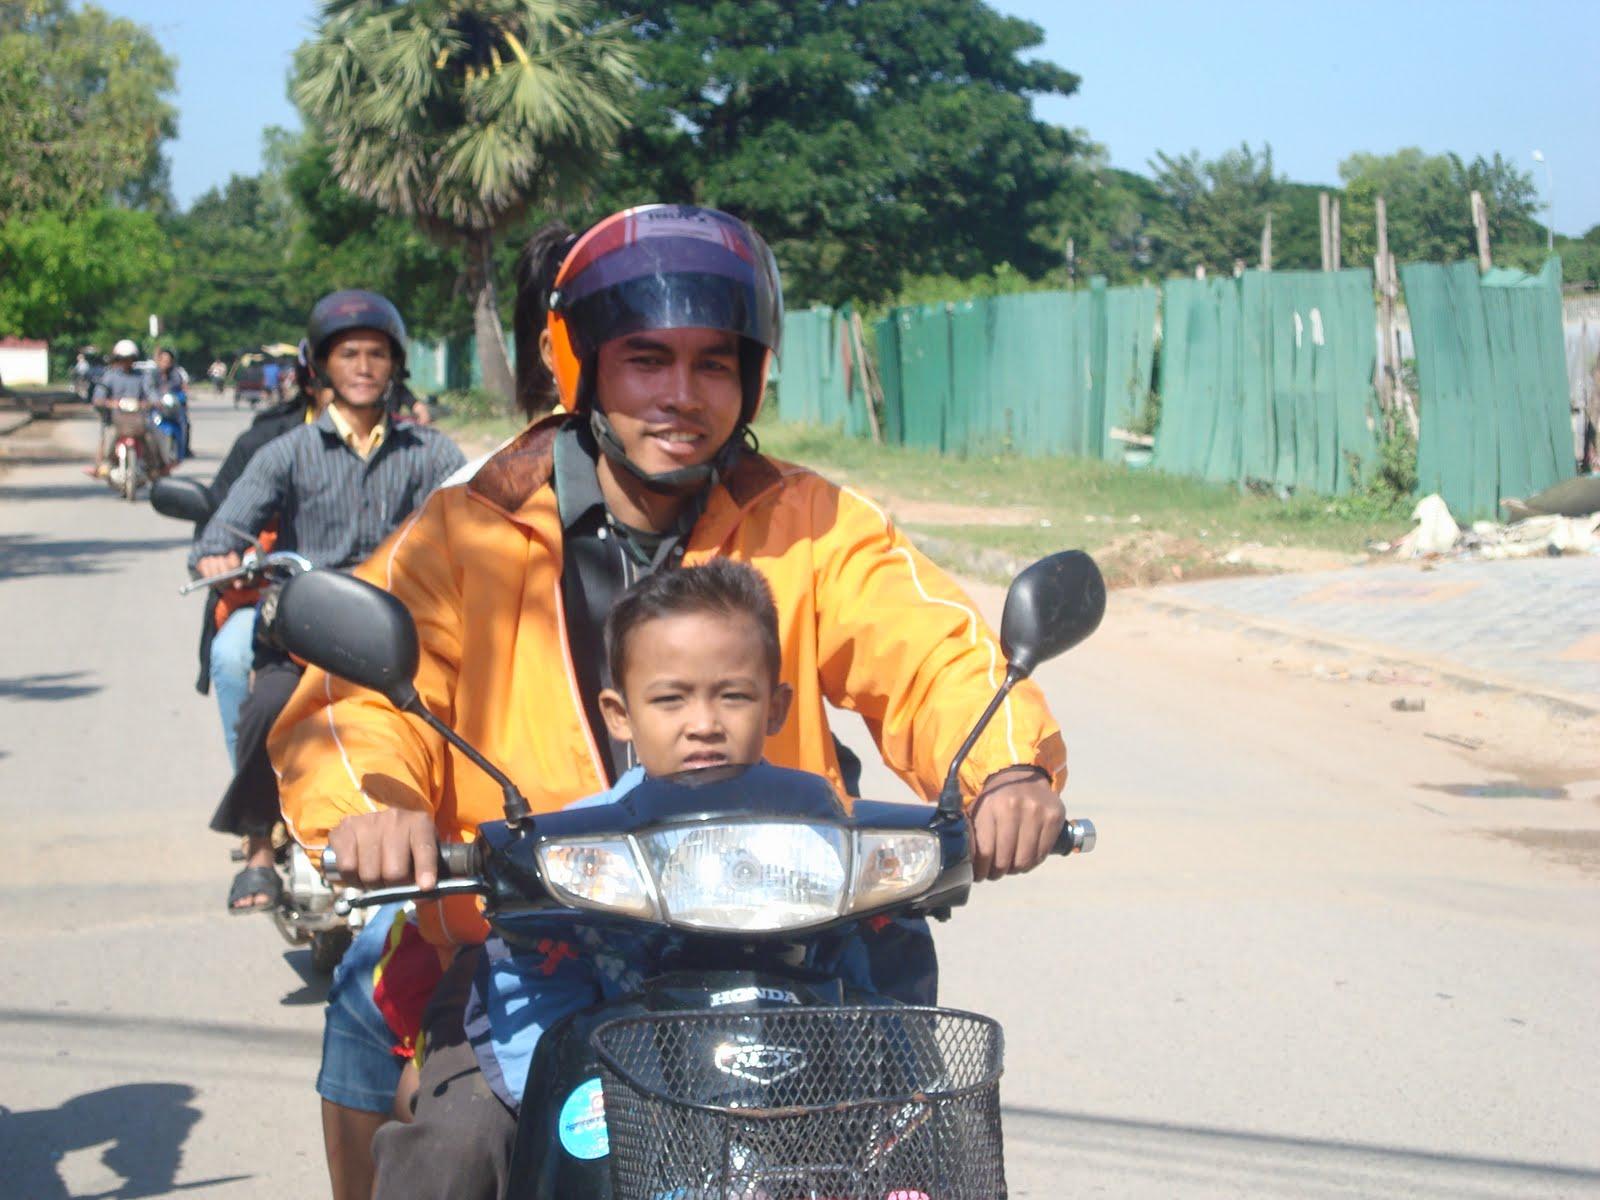 Moped Kambodscha